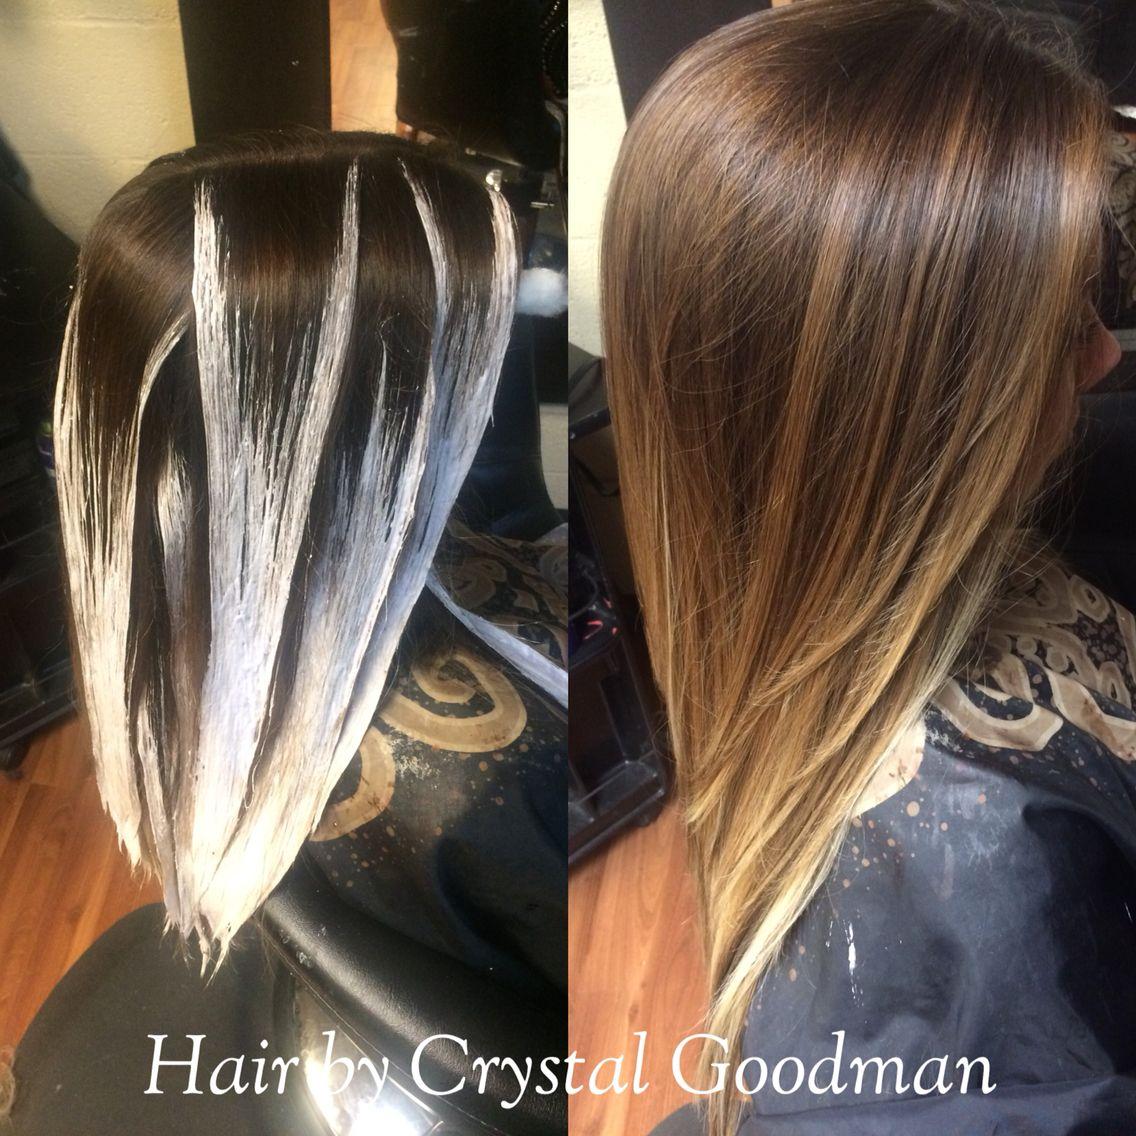 Hand Painted Balayage Hair Matrix Long Hair Ombre Hair By Crystal Goodman Hair Color Techniques Long Hair Styles Balayage Hair